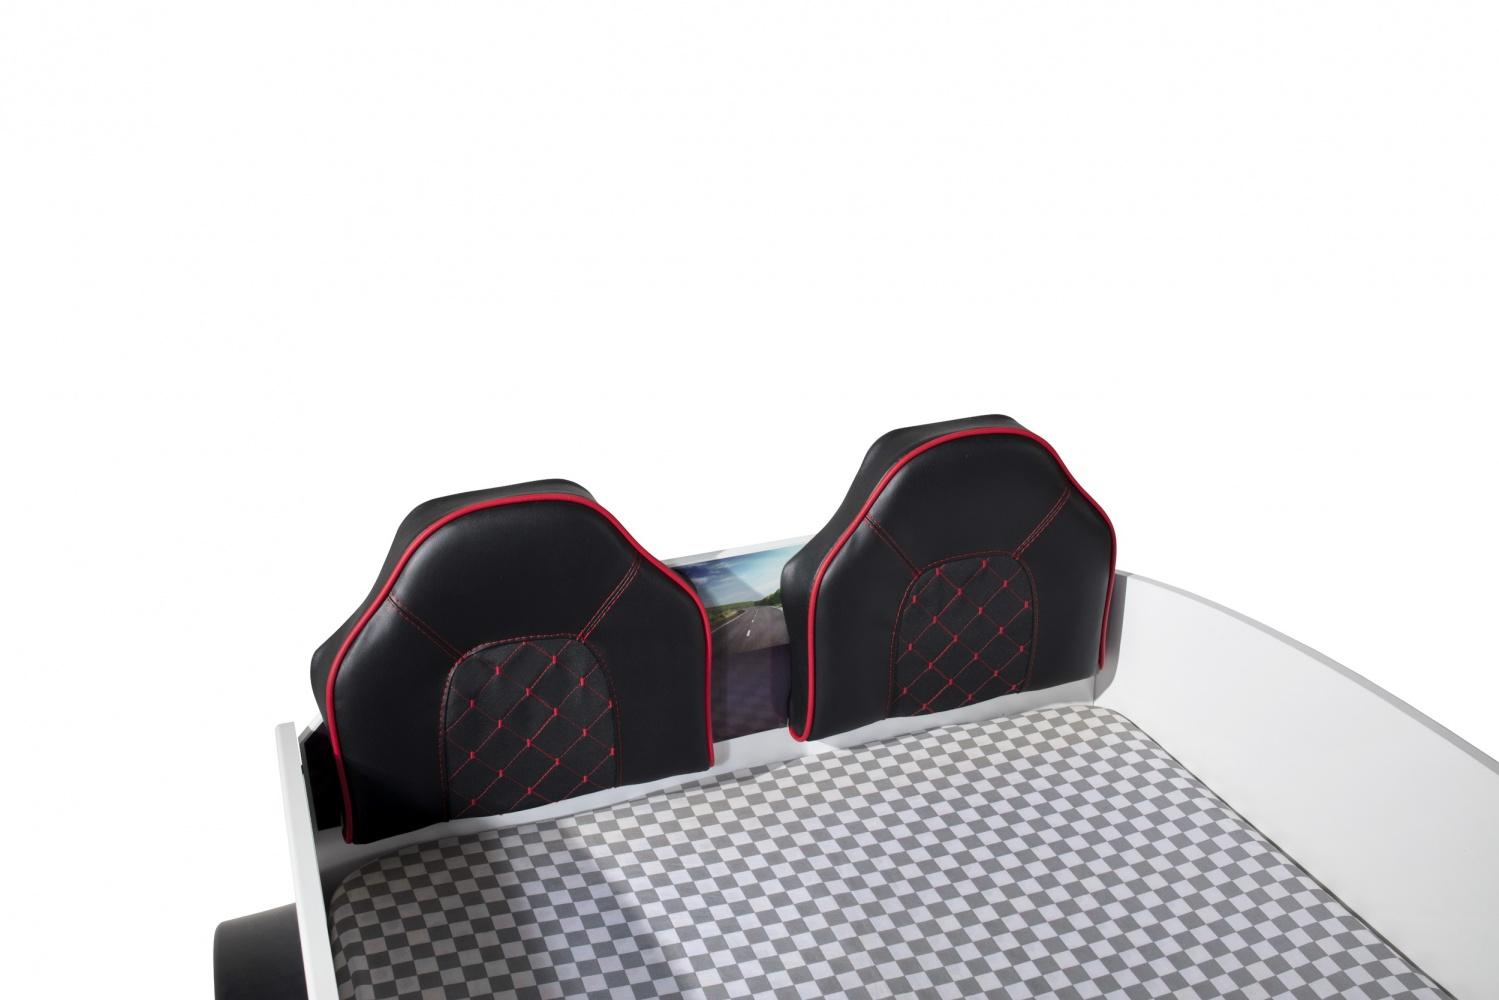 Autobettzimmer Set SPX Full Grand Prix 5-Teilig Weiß